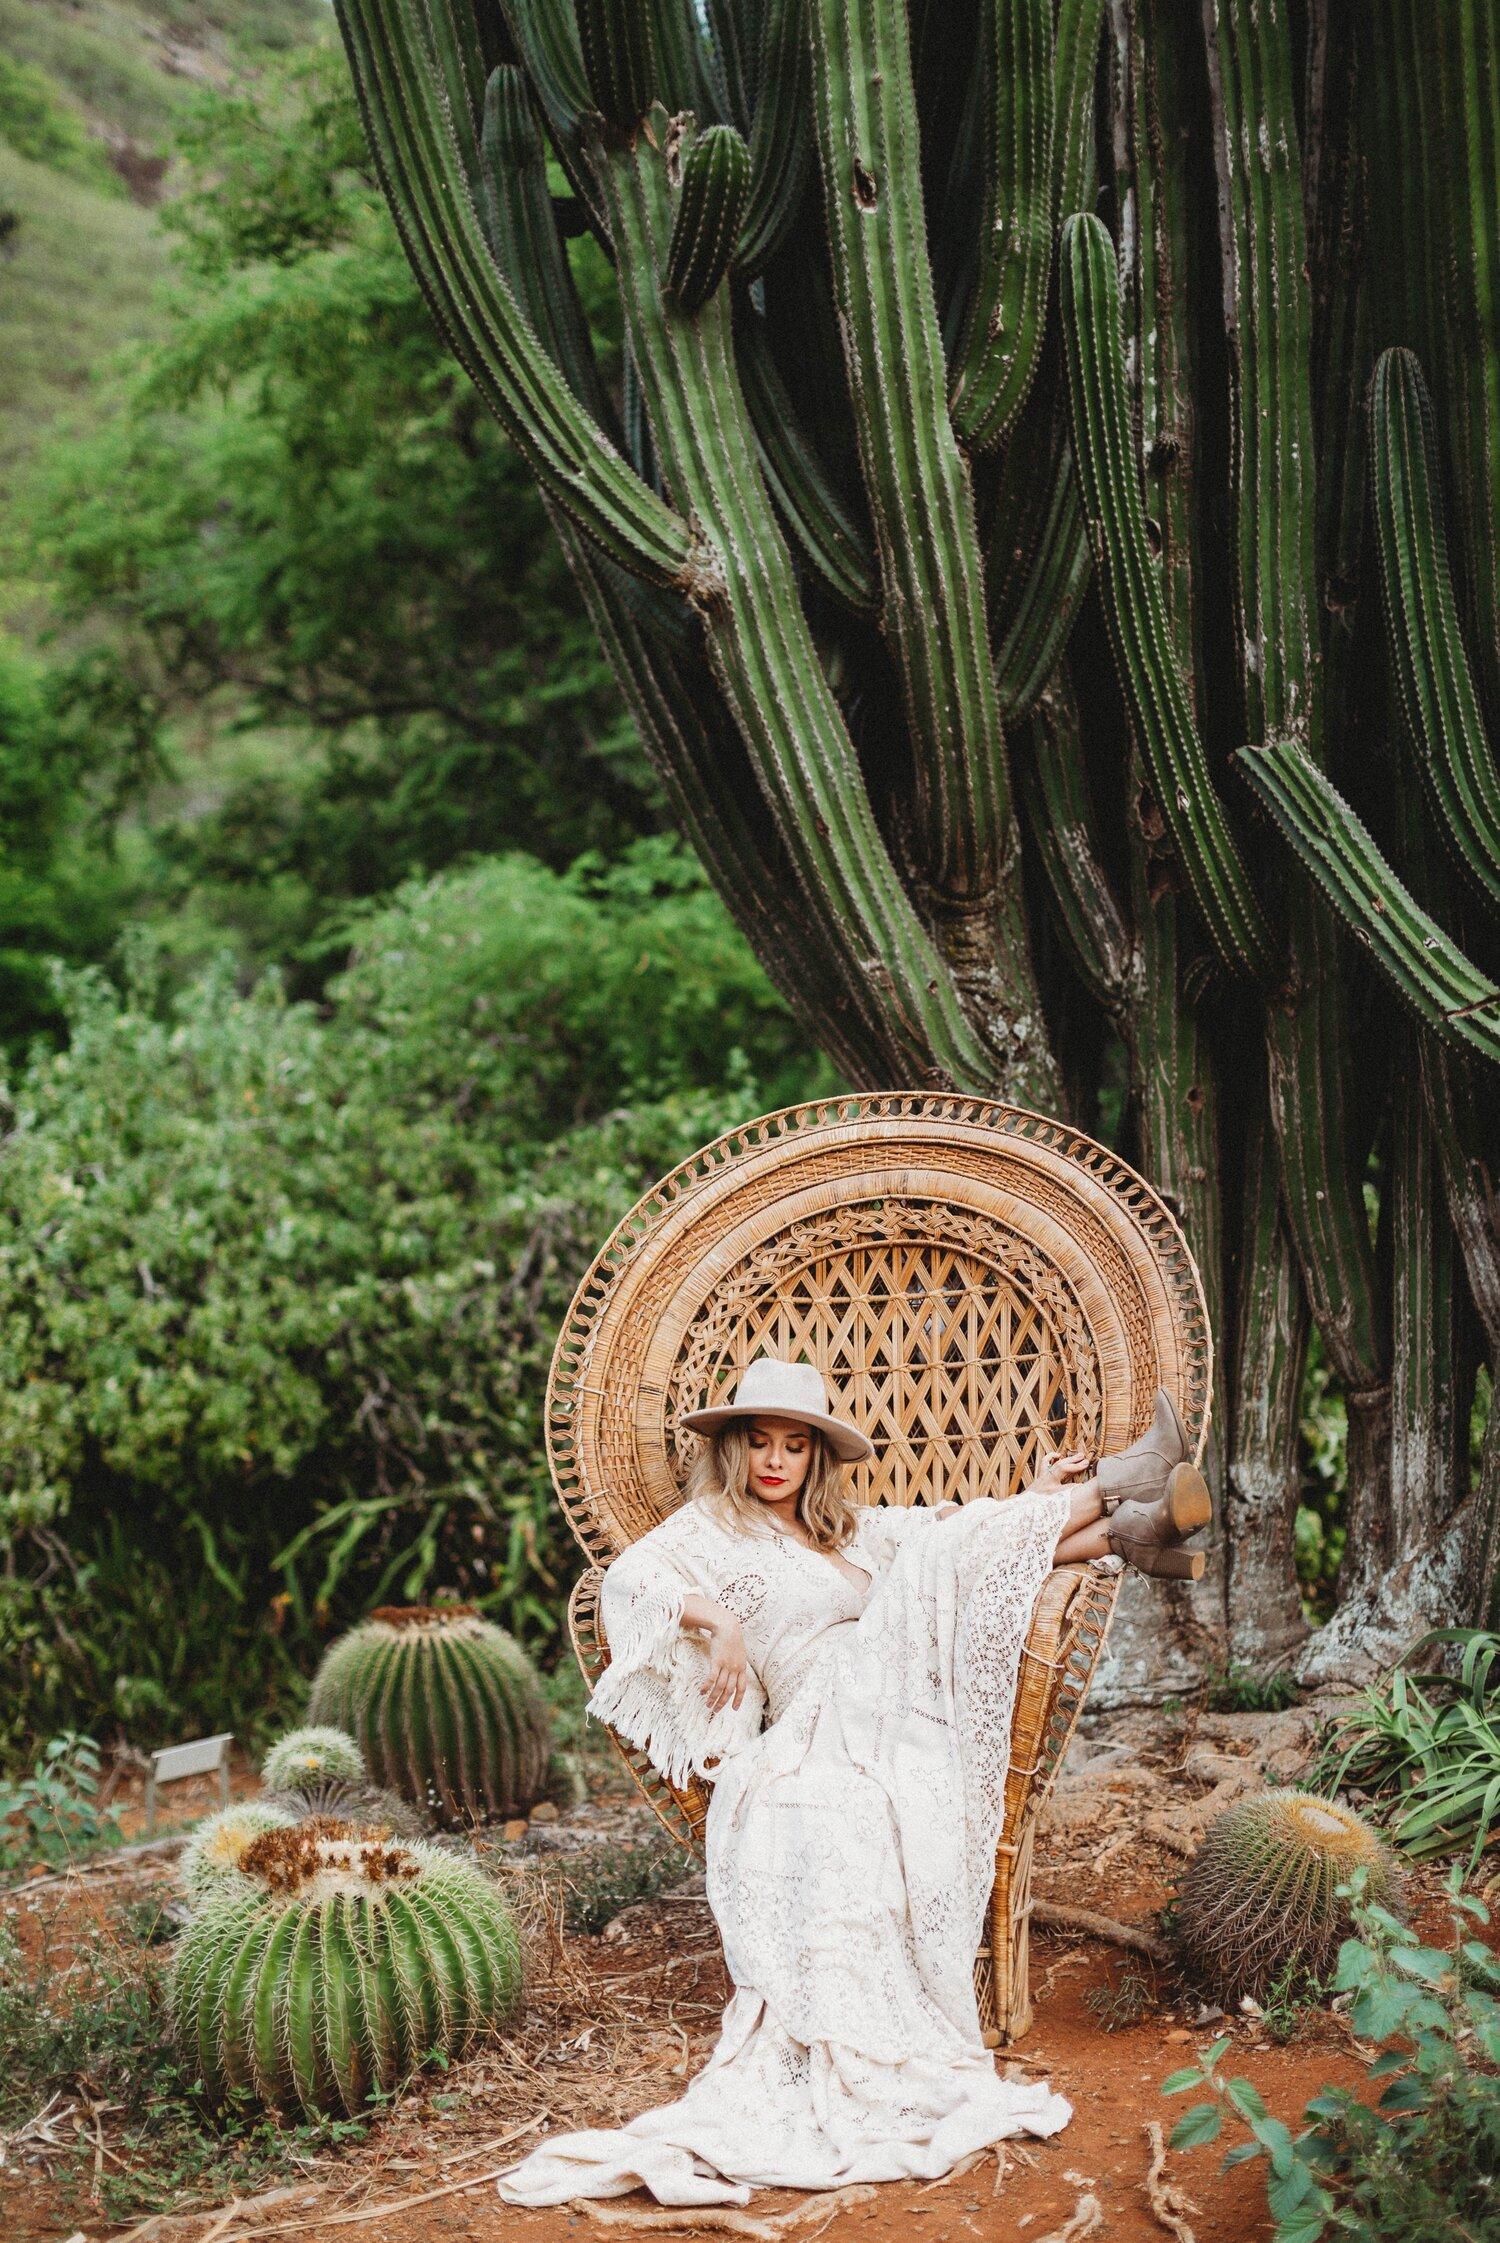 Boho Cactus Elopement - Honolulu, Koko Crater Botanical Garden - Oahu Hawaii Wedding Photographer 10.jpg